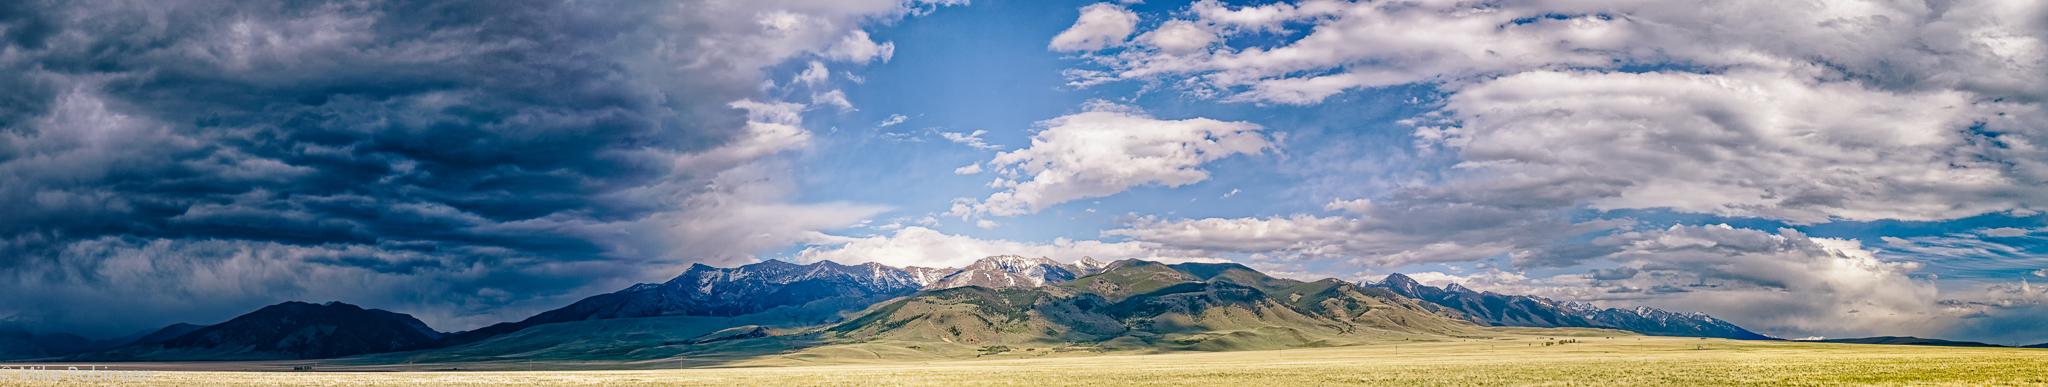 Pano_Wyoming_Spring_Skies